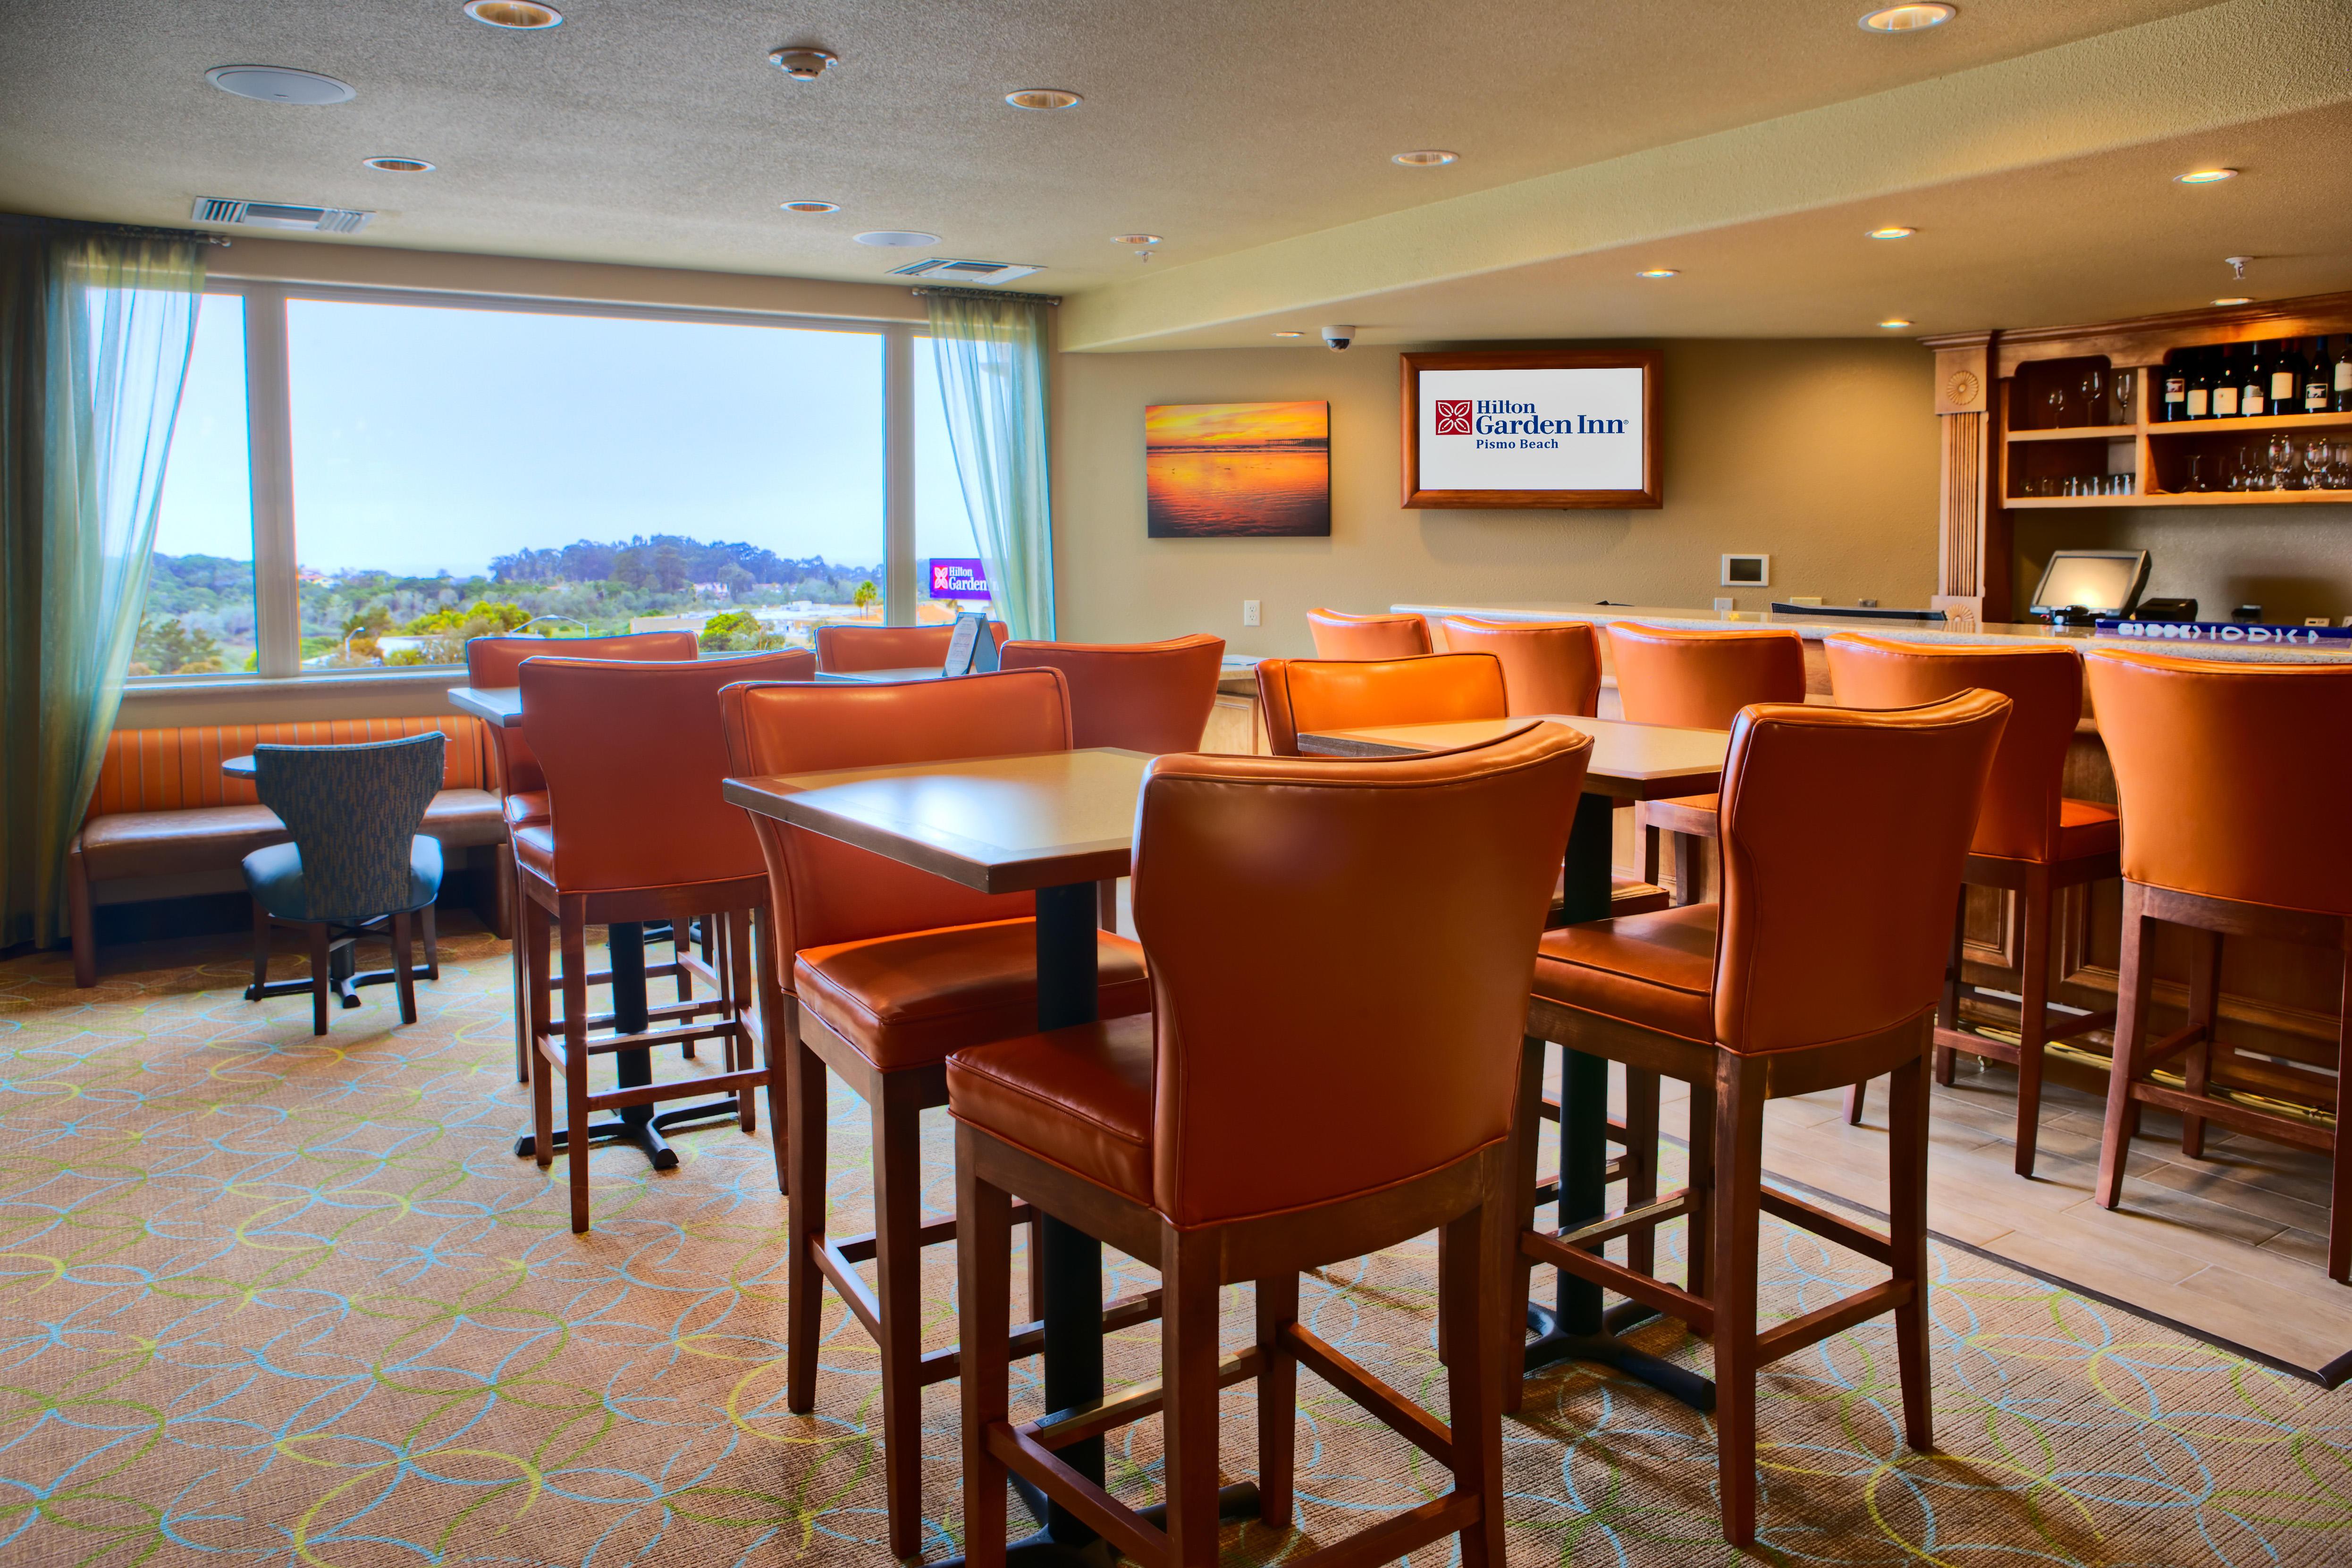 Hilton Garden Inn San Luis Obispo Pismo Beach Pismo Beach Ca Company Profile